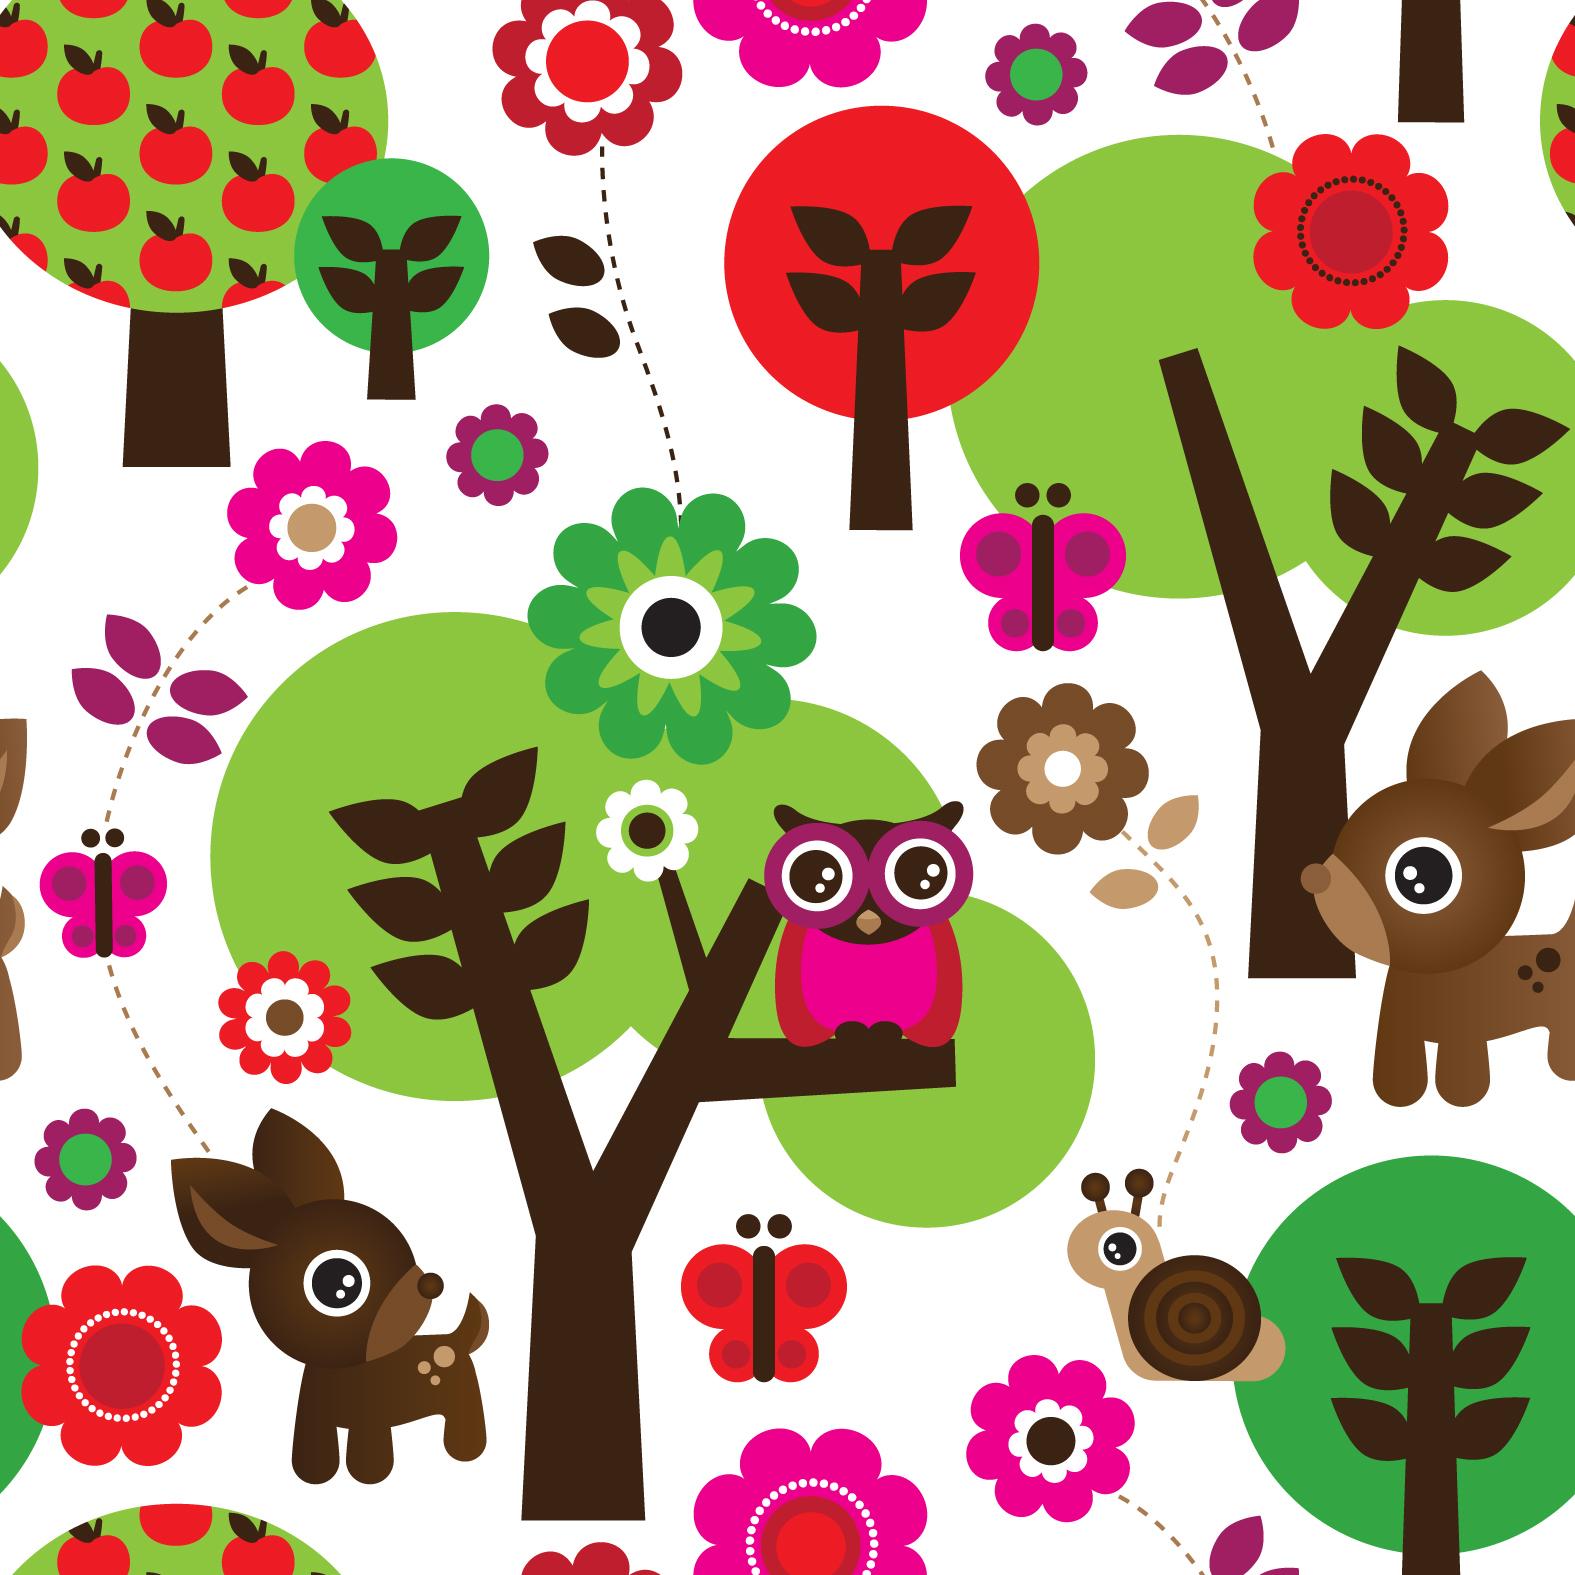 little smilemakers studio: > Cute owl forrest pattern online